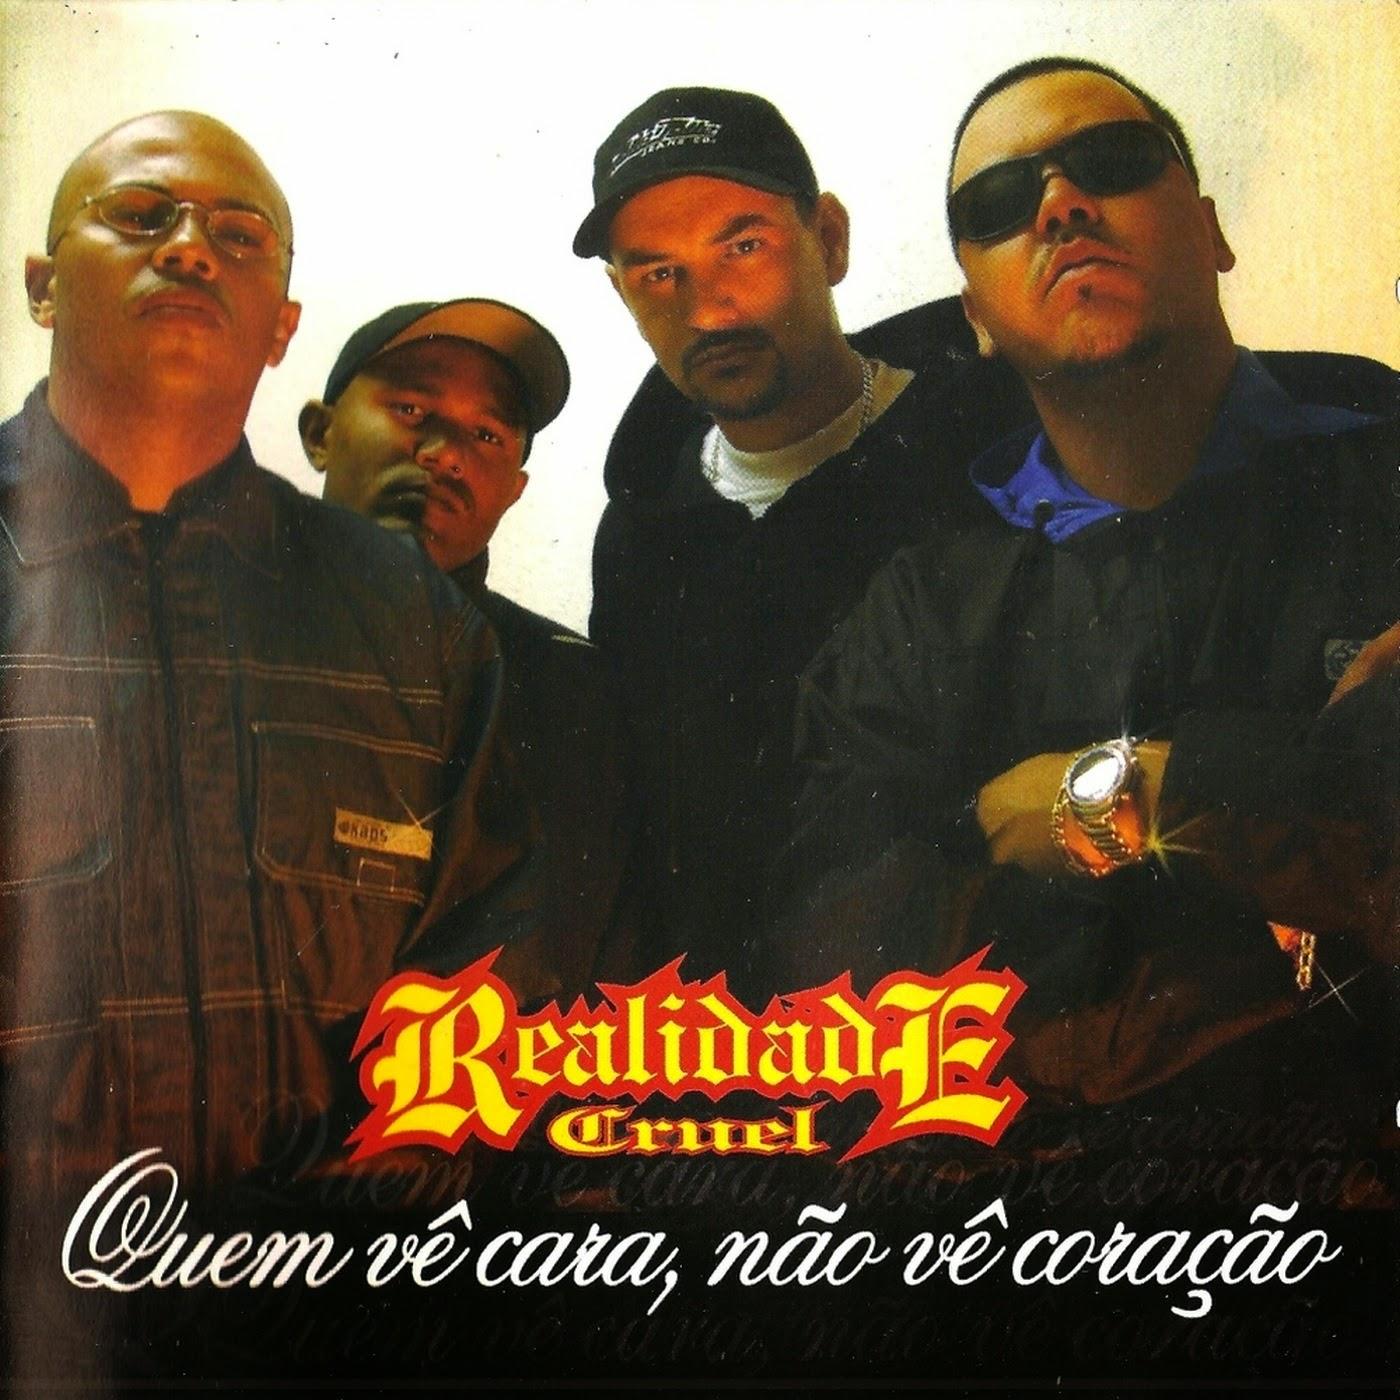 MP3 BAIXAR REALIDADE VISITA DIA CRUEL DE